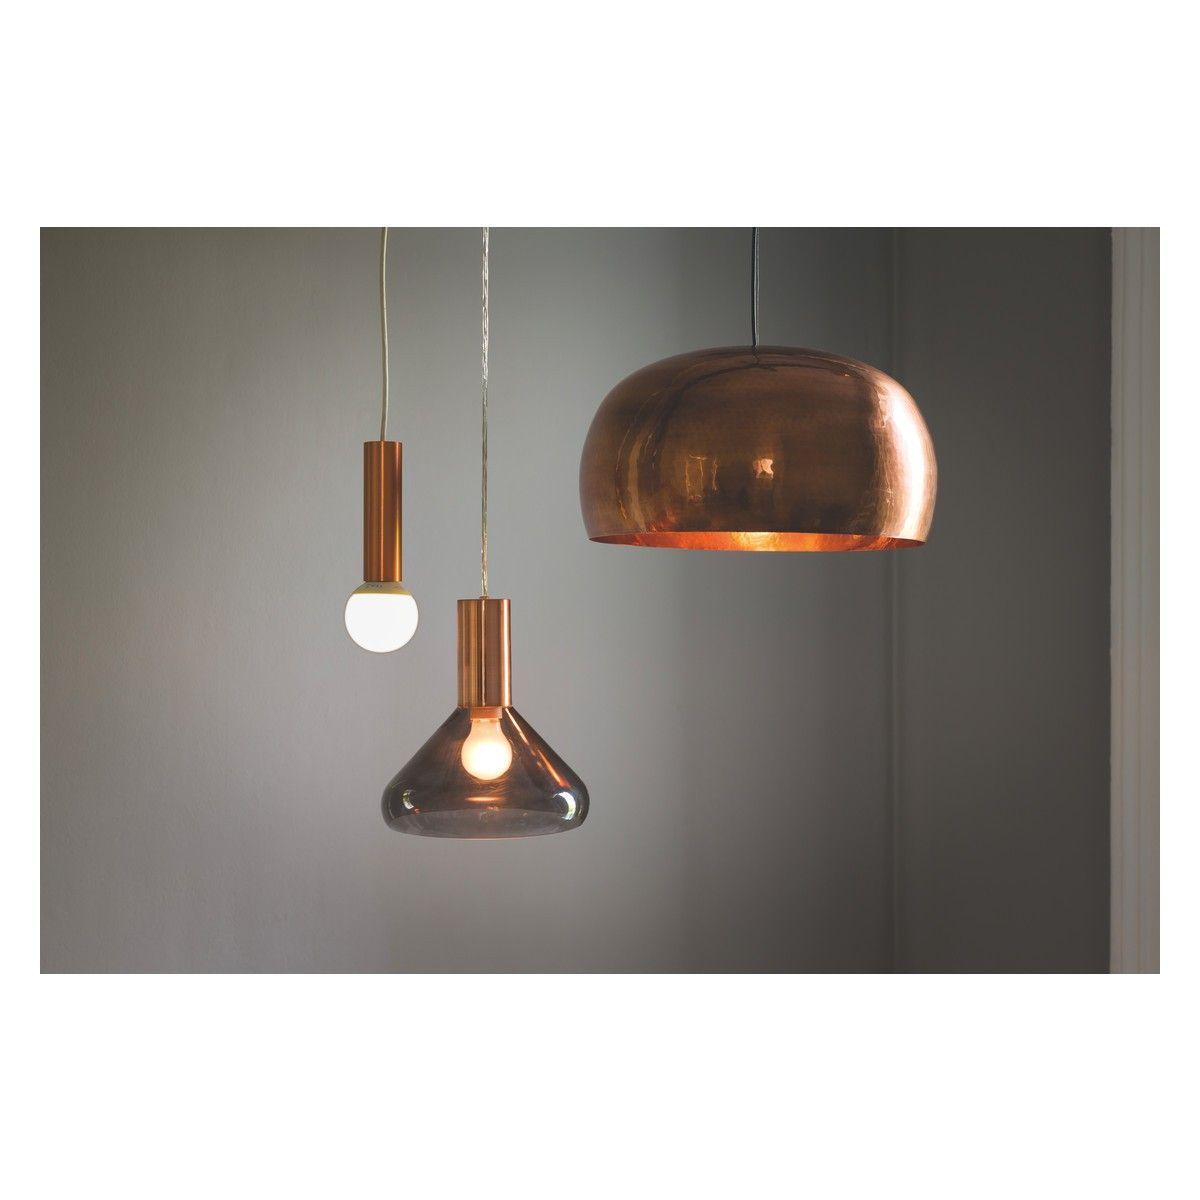 MARTEAU Large Copper Coated Brass Ceiling Light